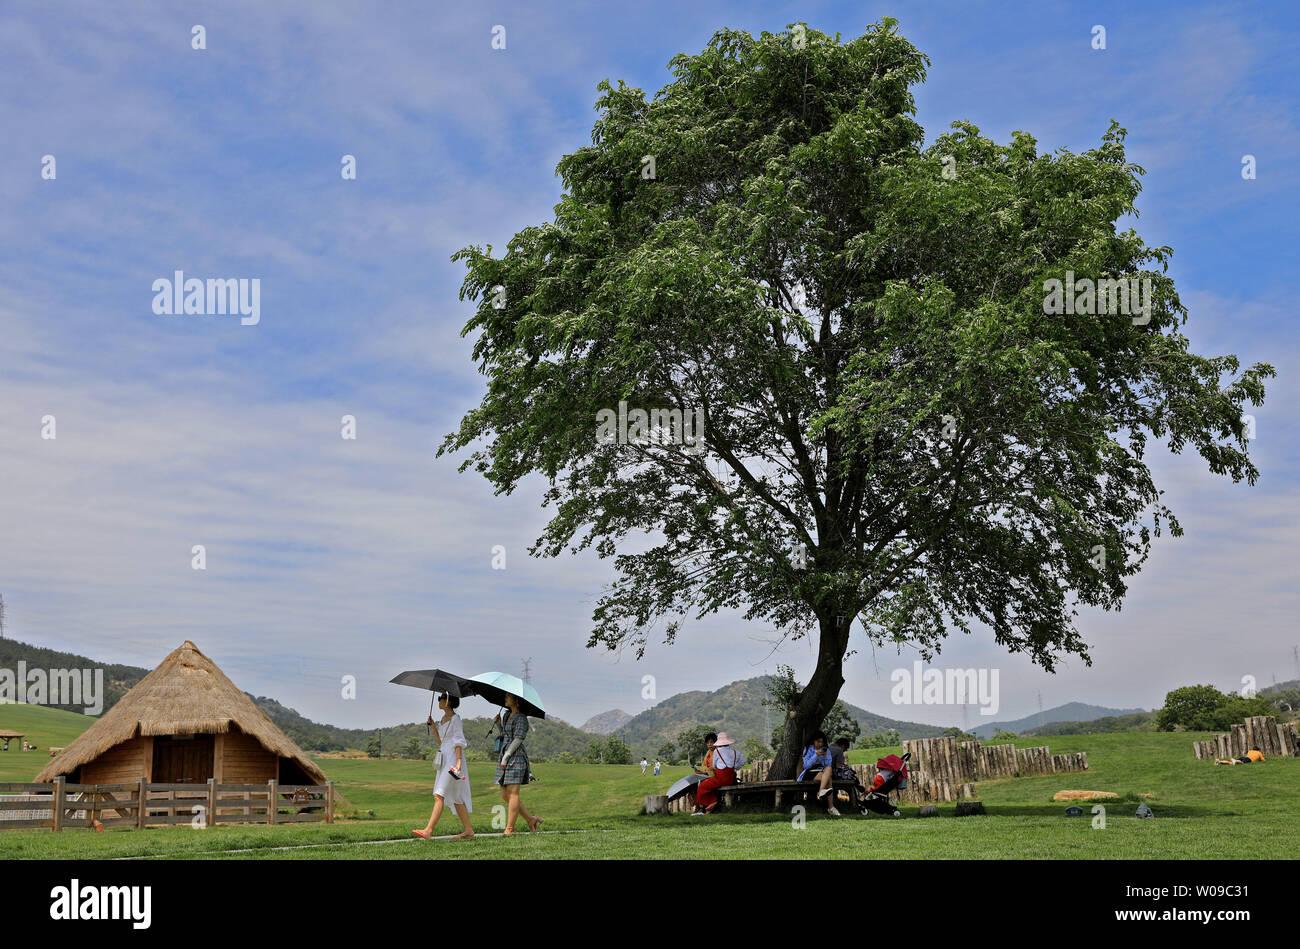 (190627) -- DALIAN, June 27, 2019 (Xinhua) -- Tourists visit the Sanhuan pastureland in Dalian, northeast China's Liaoning Province, June 26, 2019. (Xinhua/Yao Jianfeng) - Stock Image